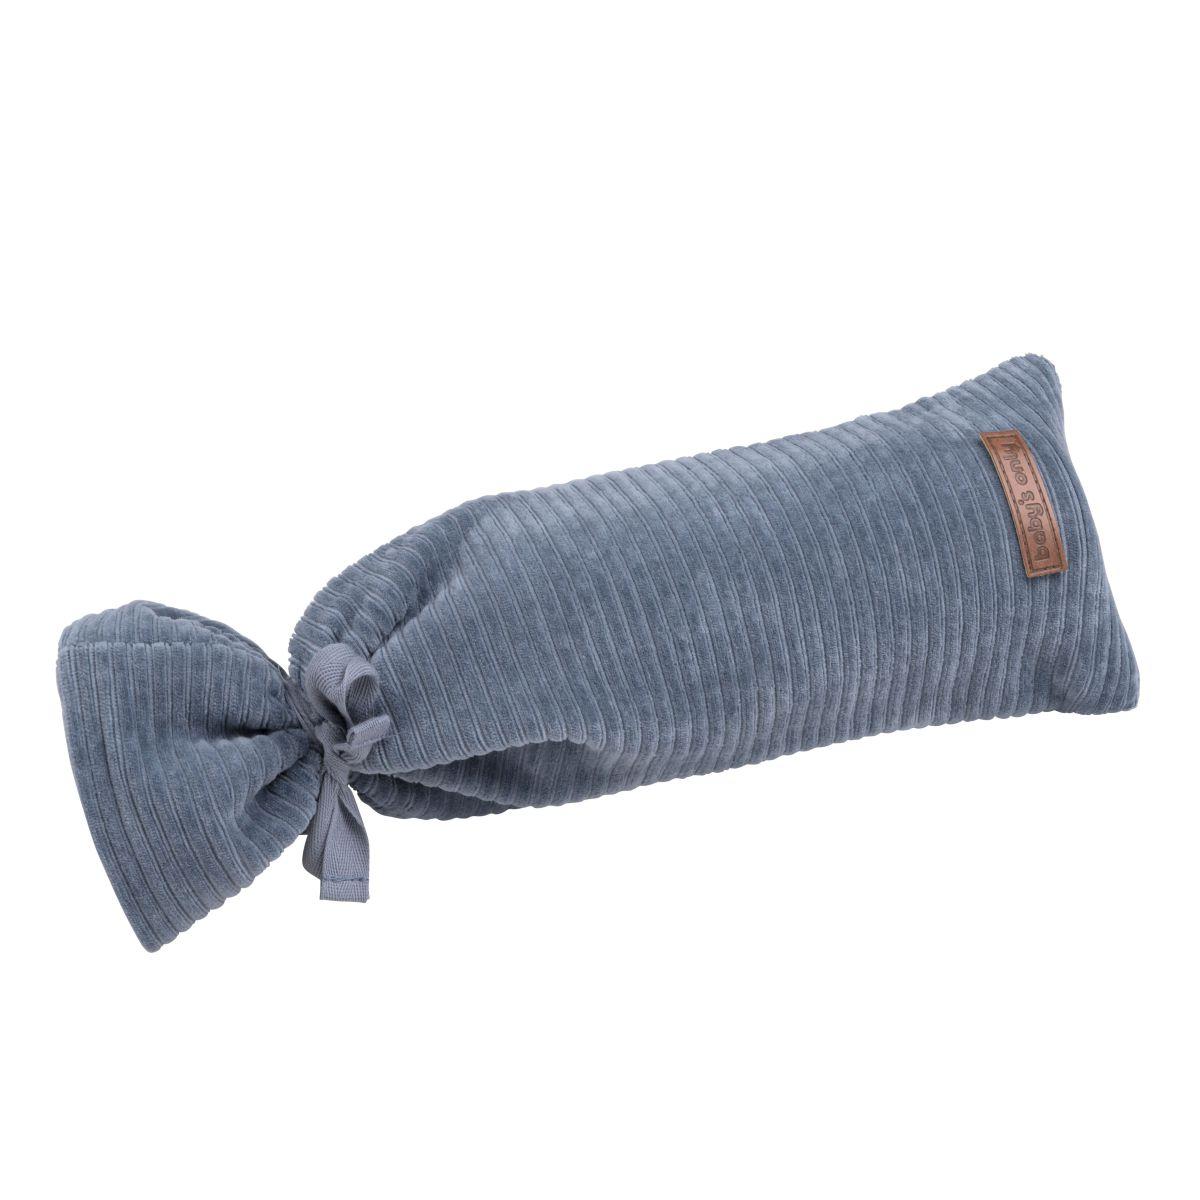 babys only bo02402703850 kruikenzak sense vintage blue 1